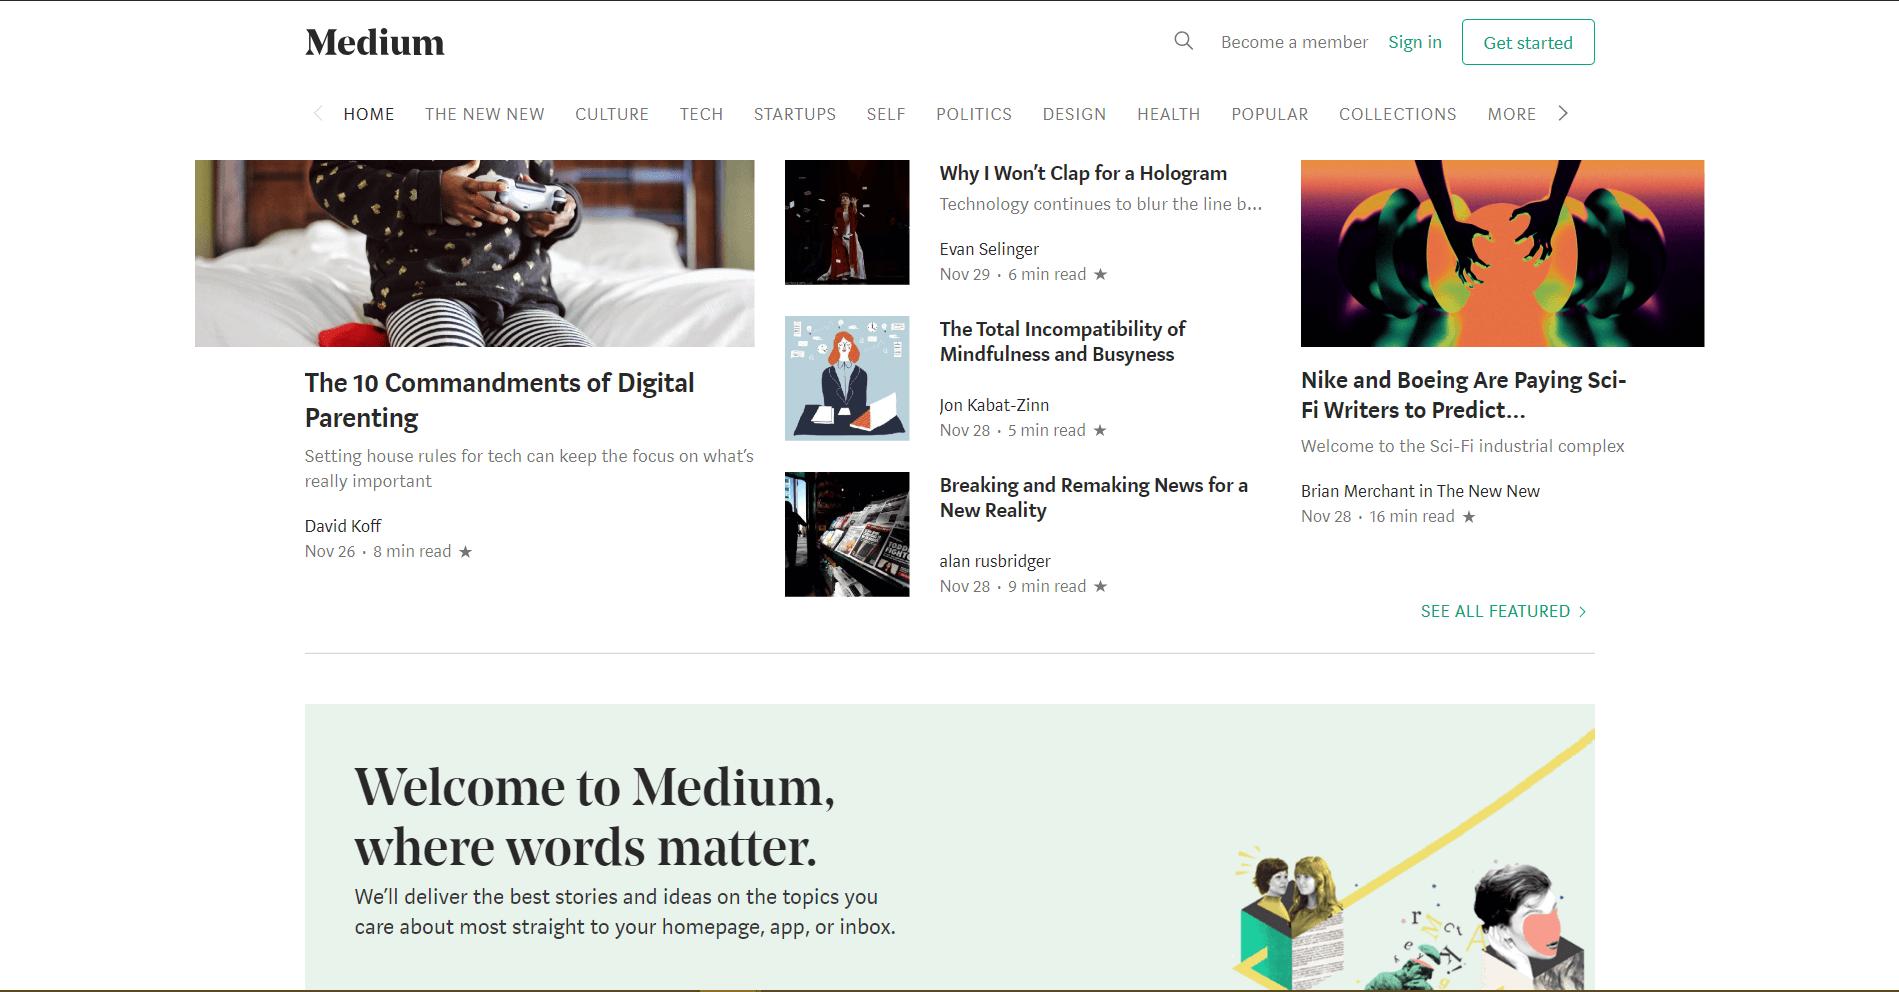 Medium Content Promotion Platforms and Tools